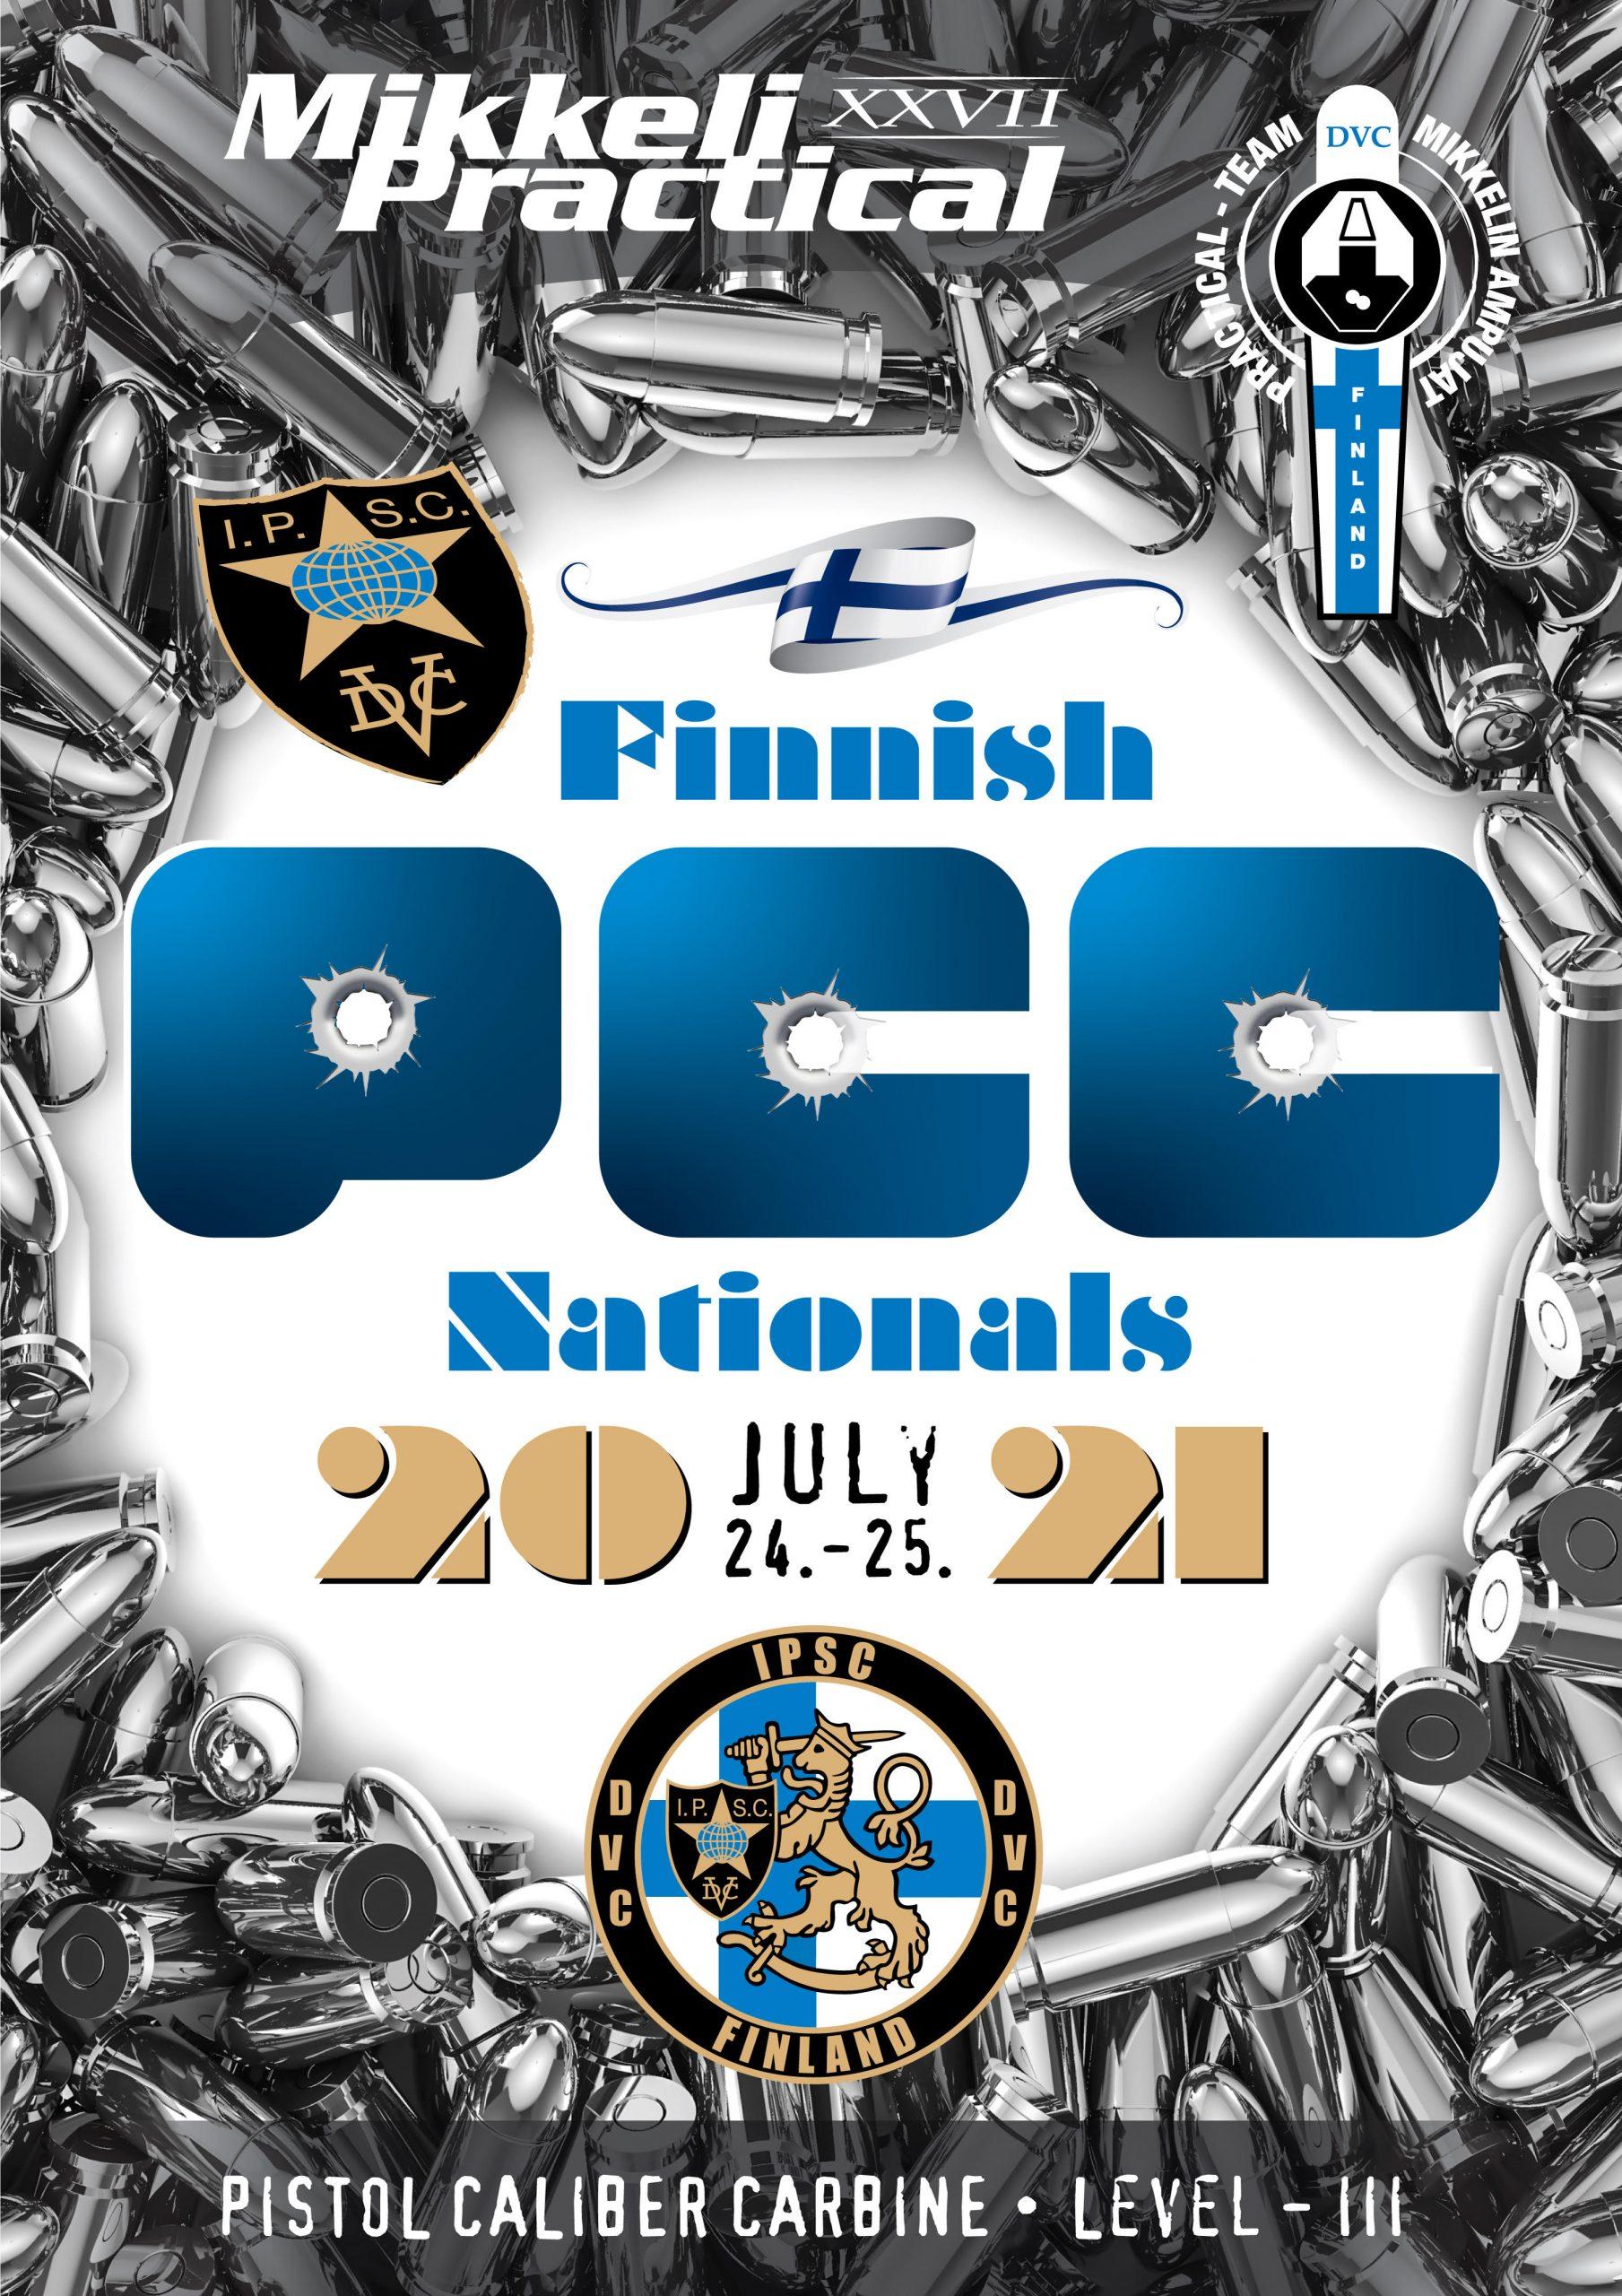 Finnish PCC Championship 2021 – Mikkeli Practical XXVII